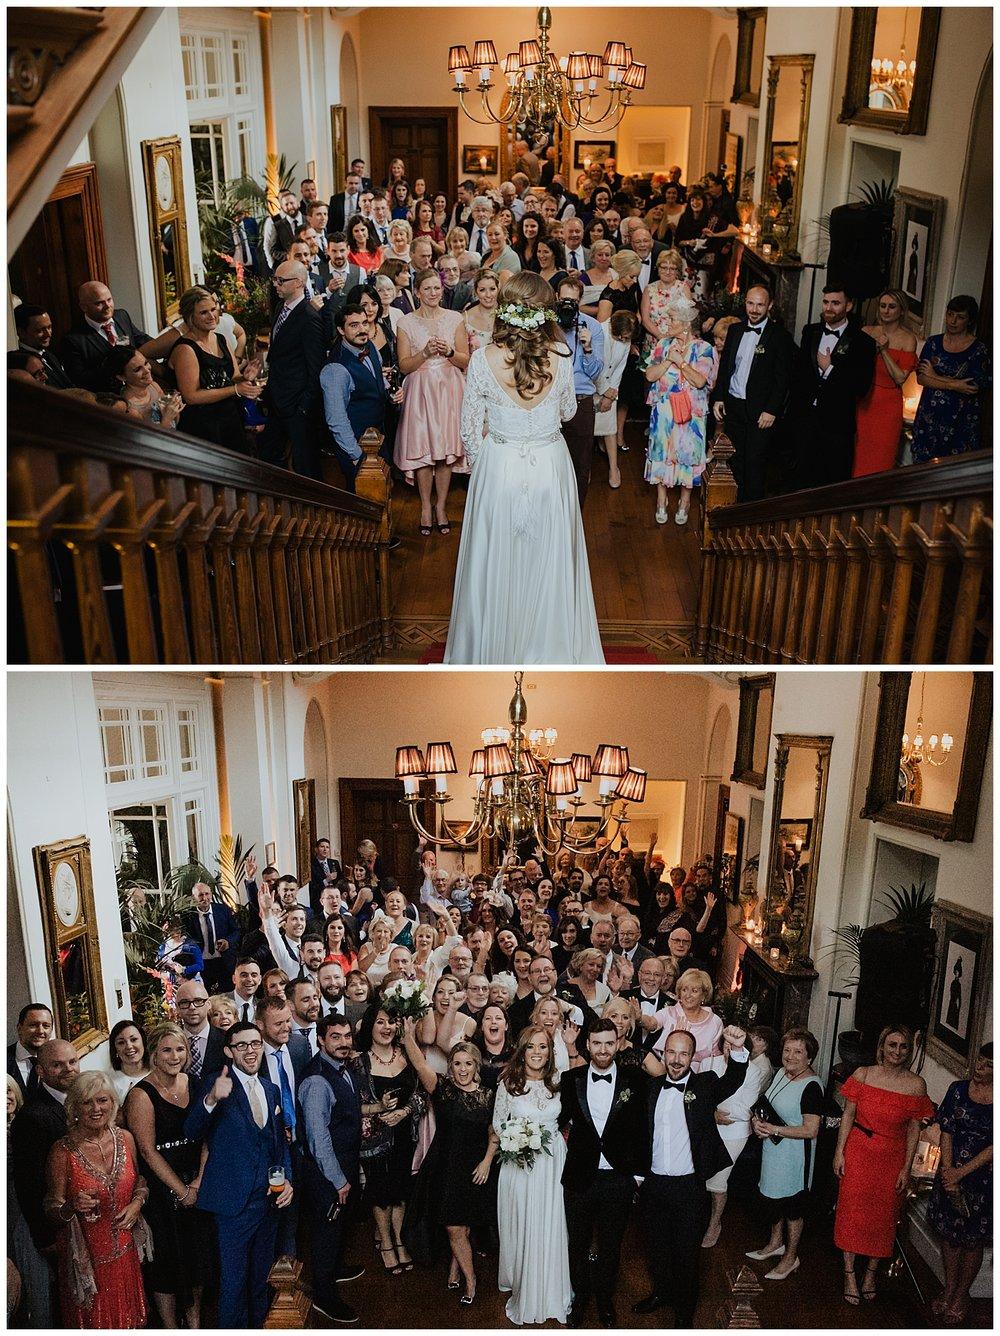 a&c_tinakilly_black_tie_wedding_photographer_livia_figueiredo_201.jpg